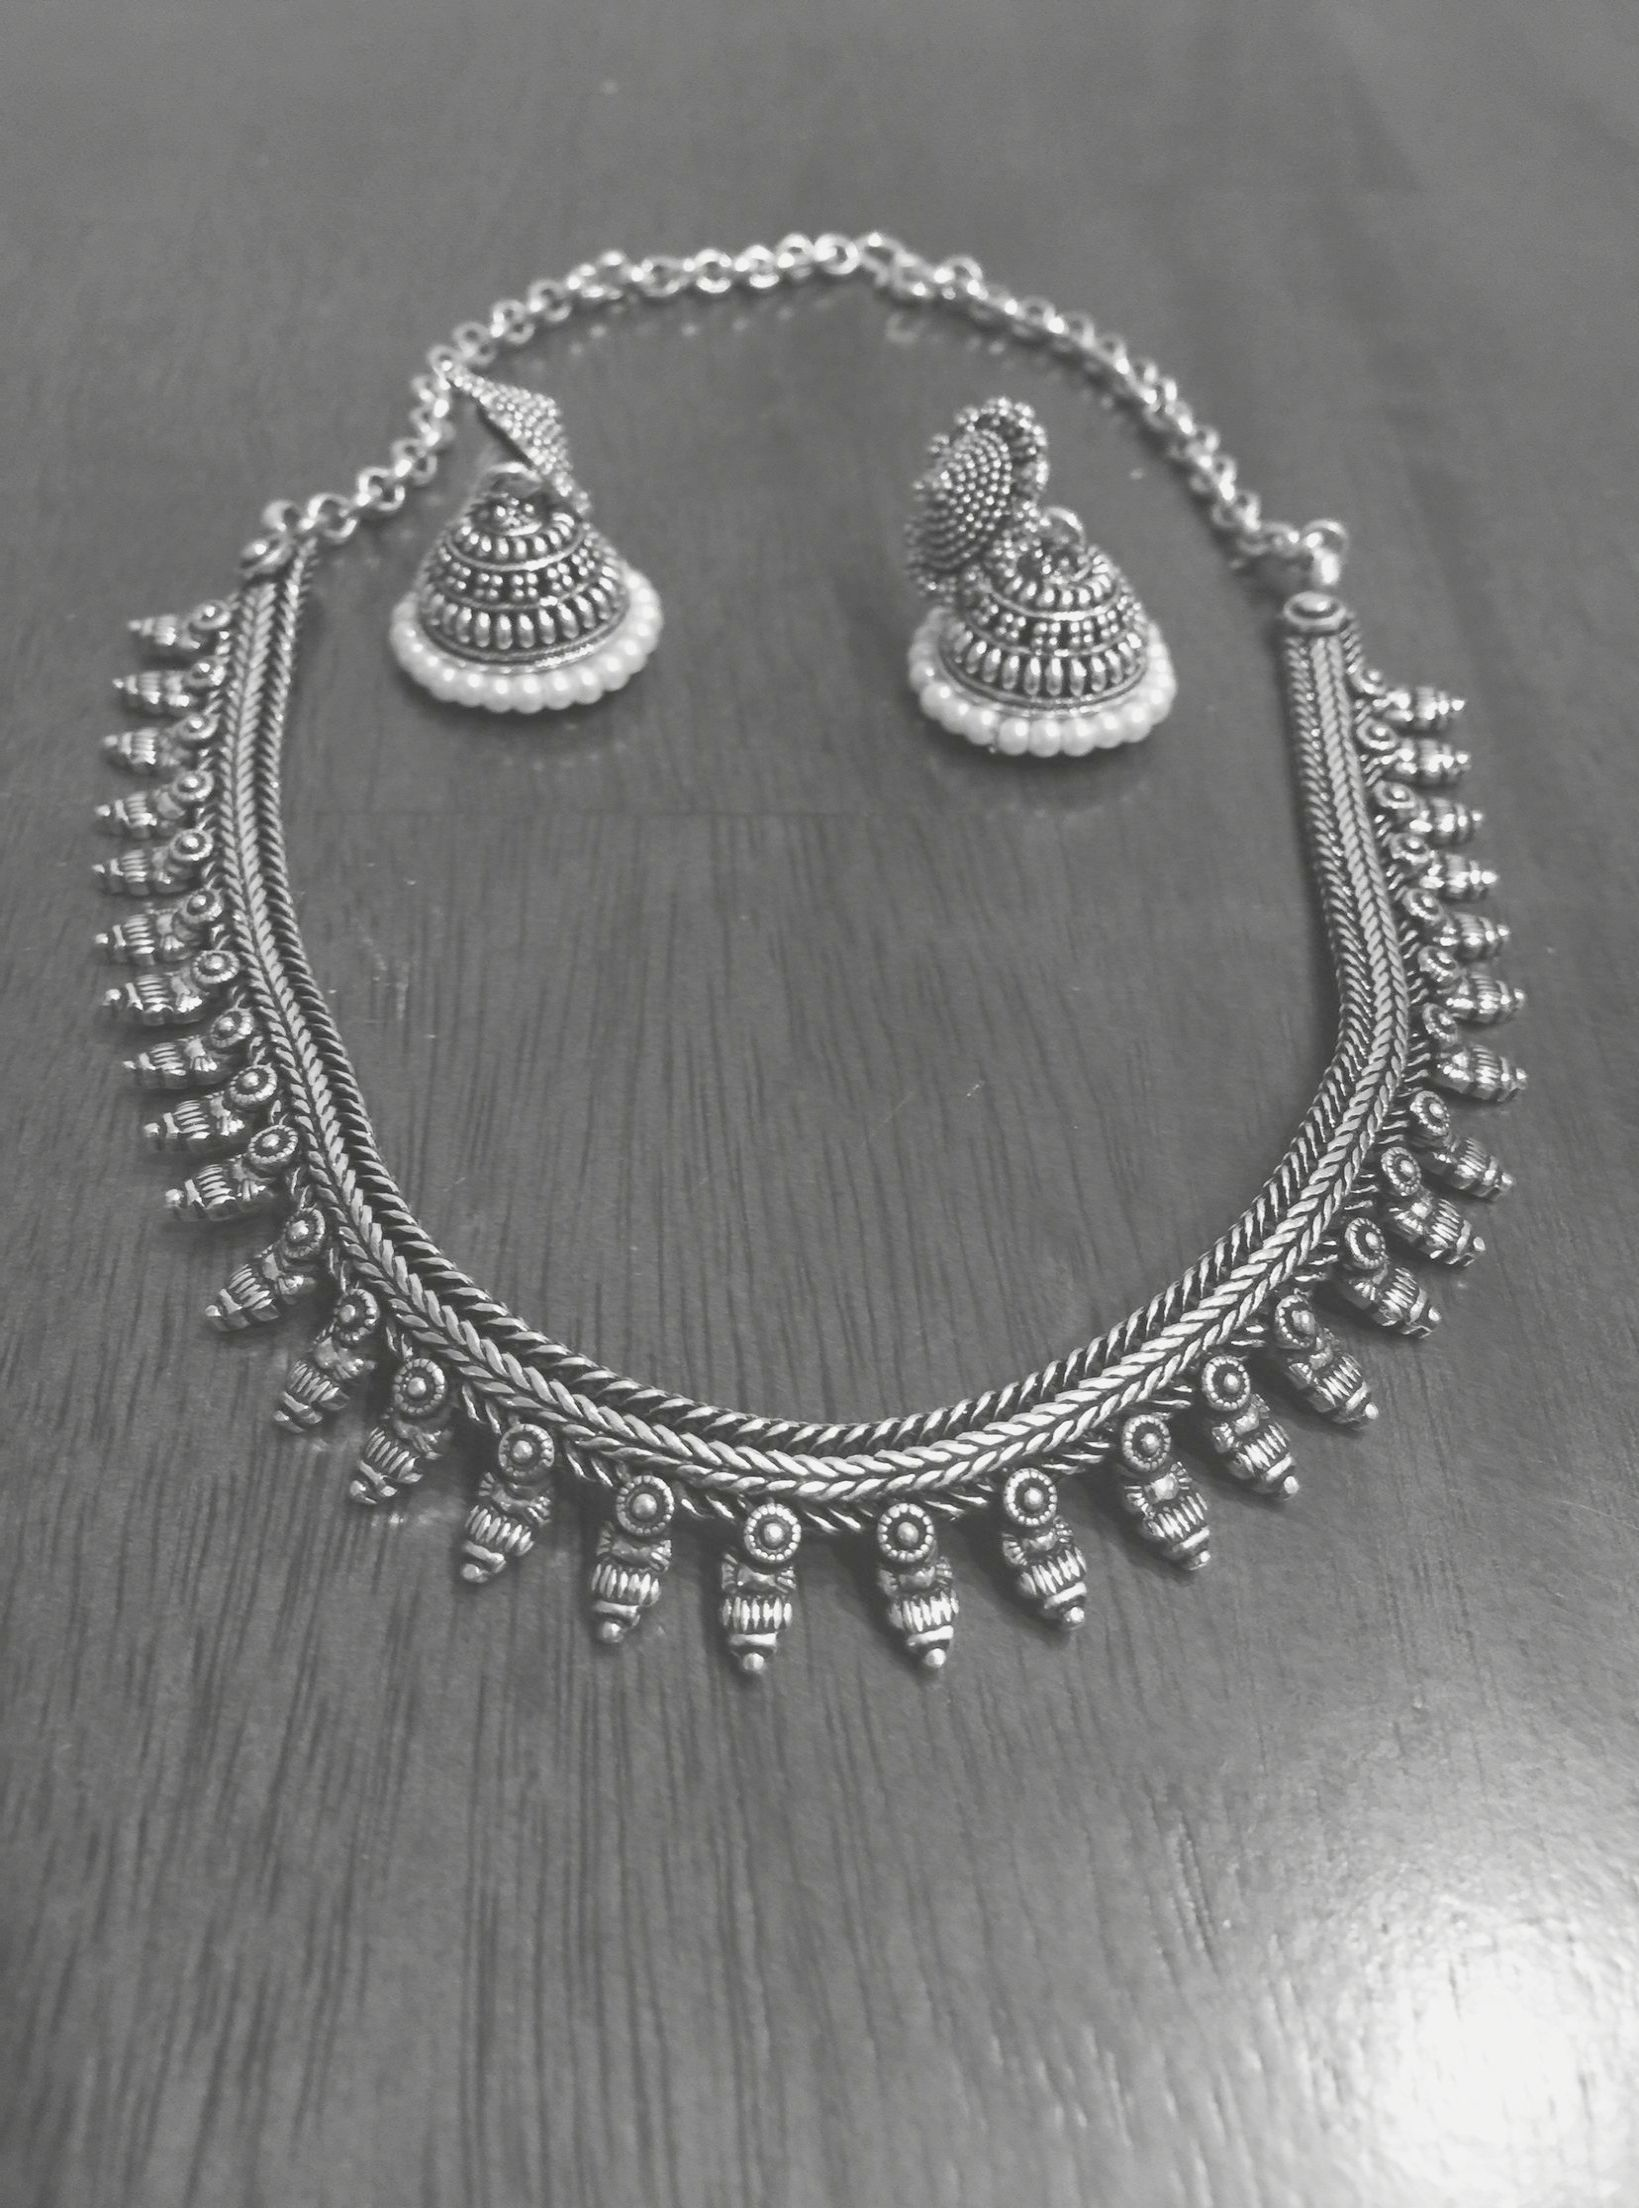 Silver Shops Near Me : silver, shops, Jewellery, Shops, Kildare, Village, Considering, Handmade, Indian, Black, Metal, Jewelry,, Silver, Indian,, Jewelry, Necklace